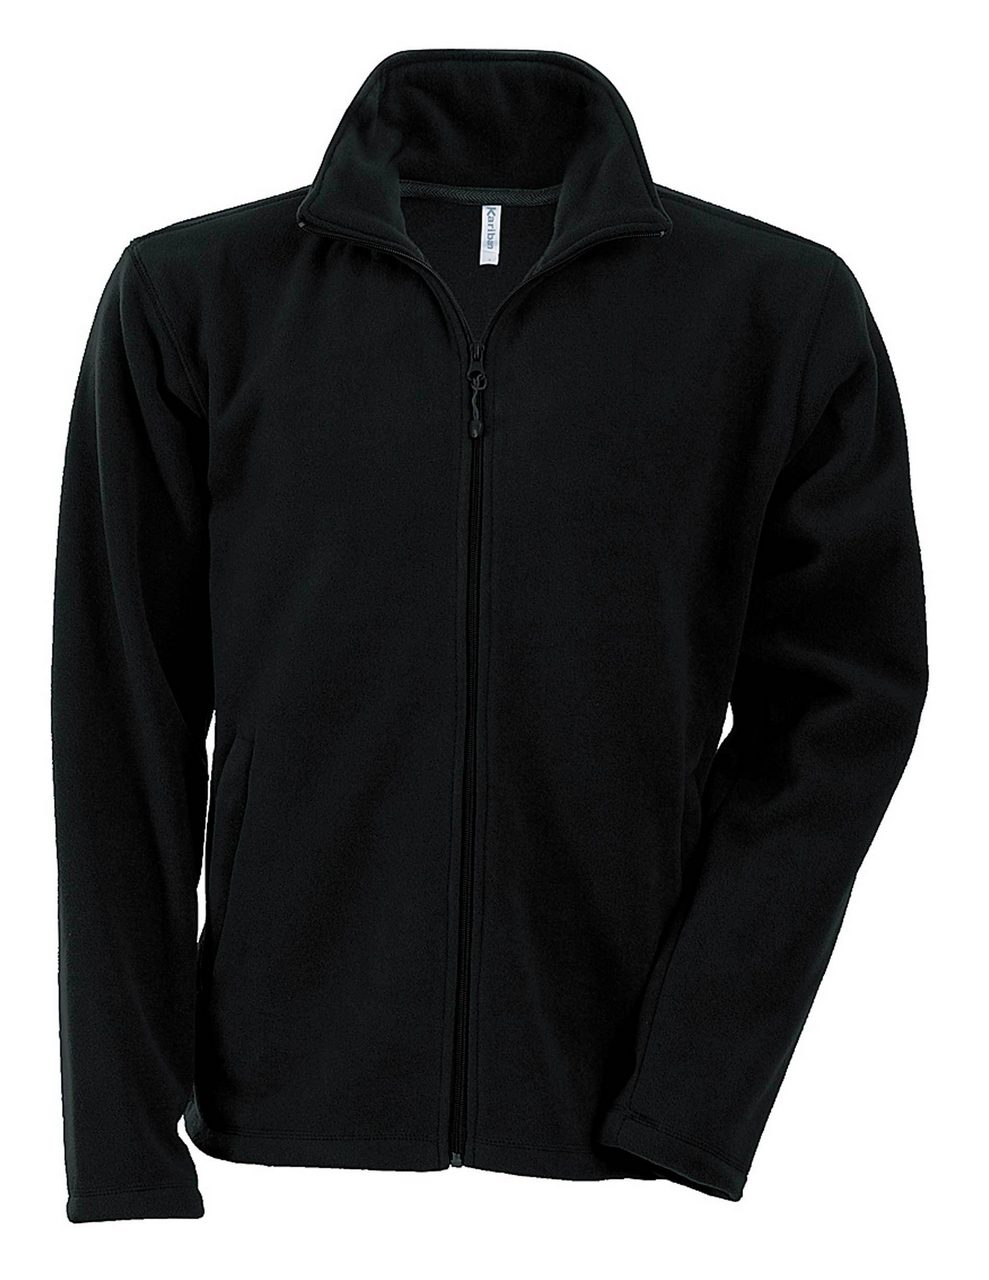 Fleece KA911 negru veste jachete dama barbatesti polar fleece softshell fas gluga ploaie vant broderie serigrafie termotransfer | Toroadv.ro